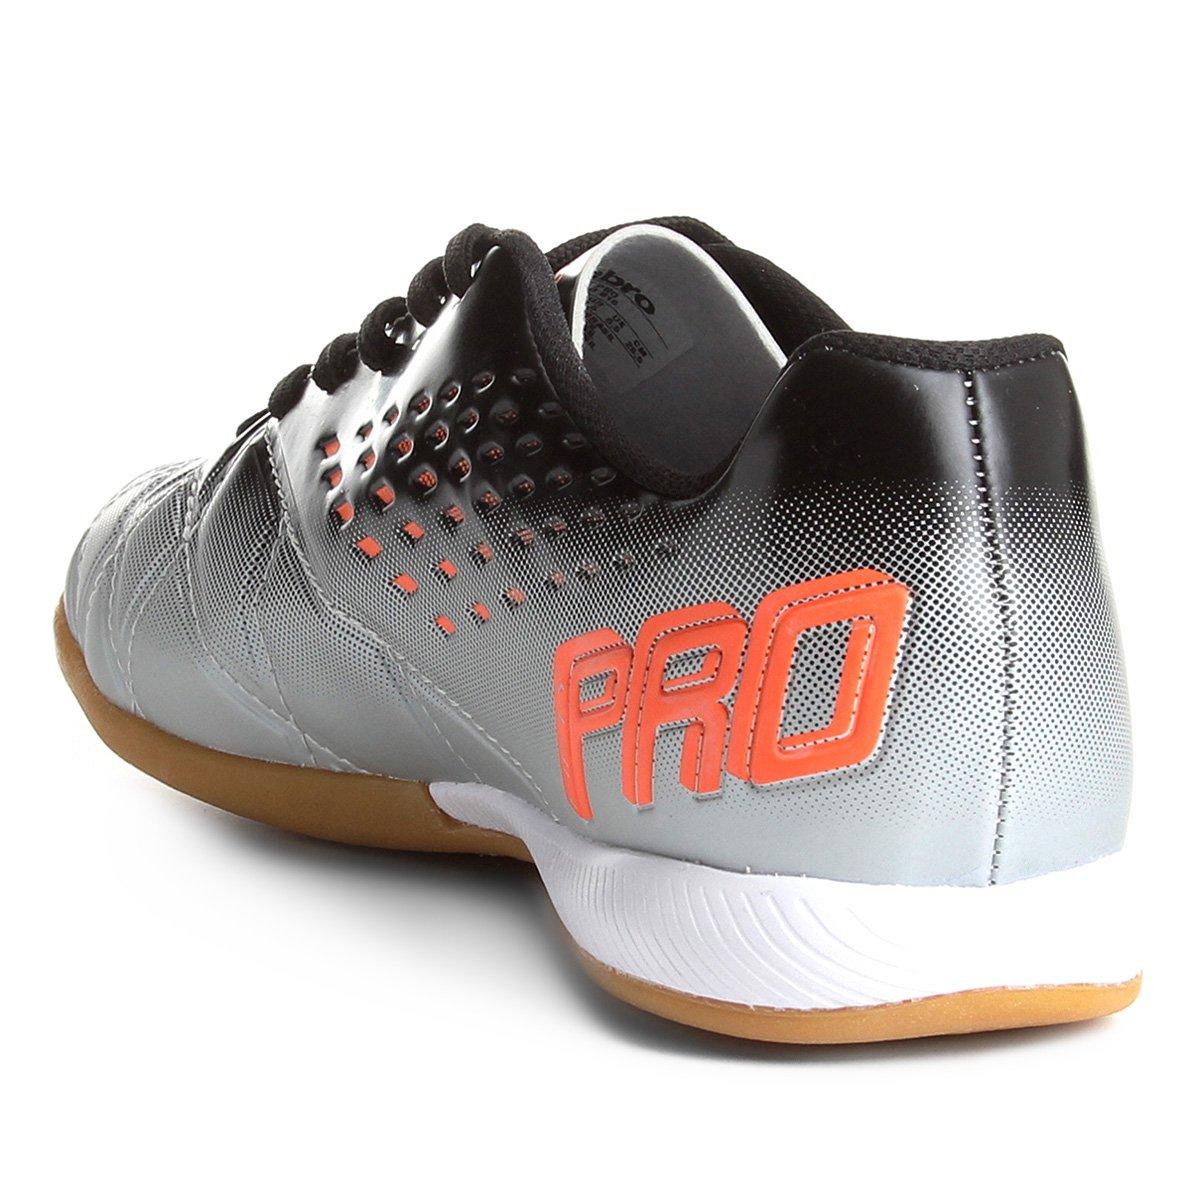 845e0a340c Chuteira Futsal Umbro Fifty Pro - Cinza e Preto - Compre Agora ...